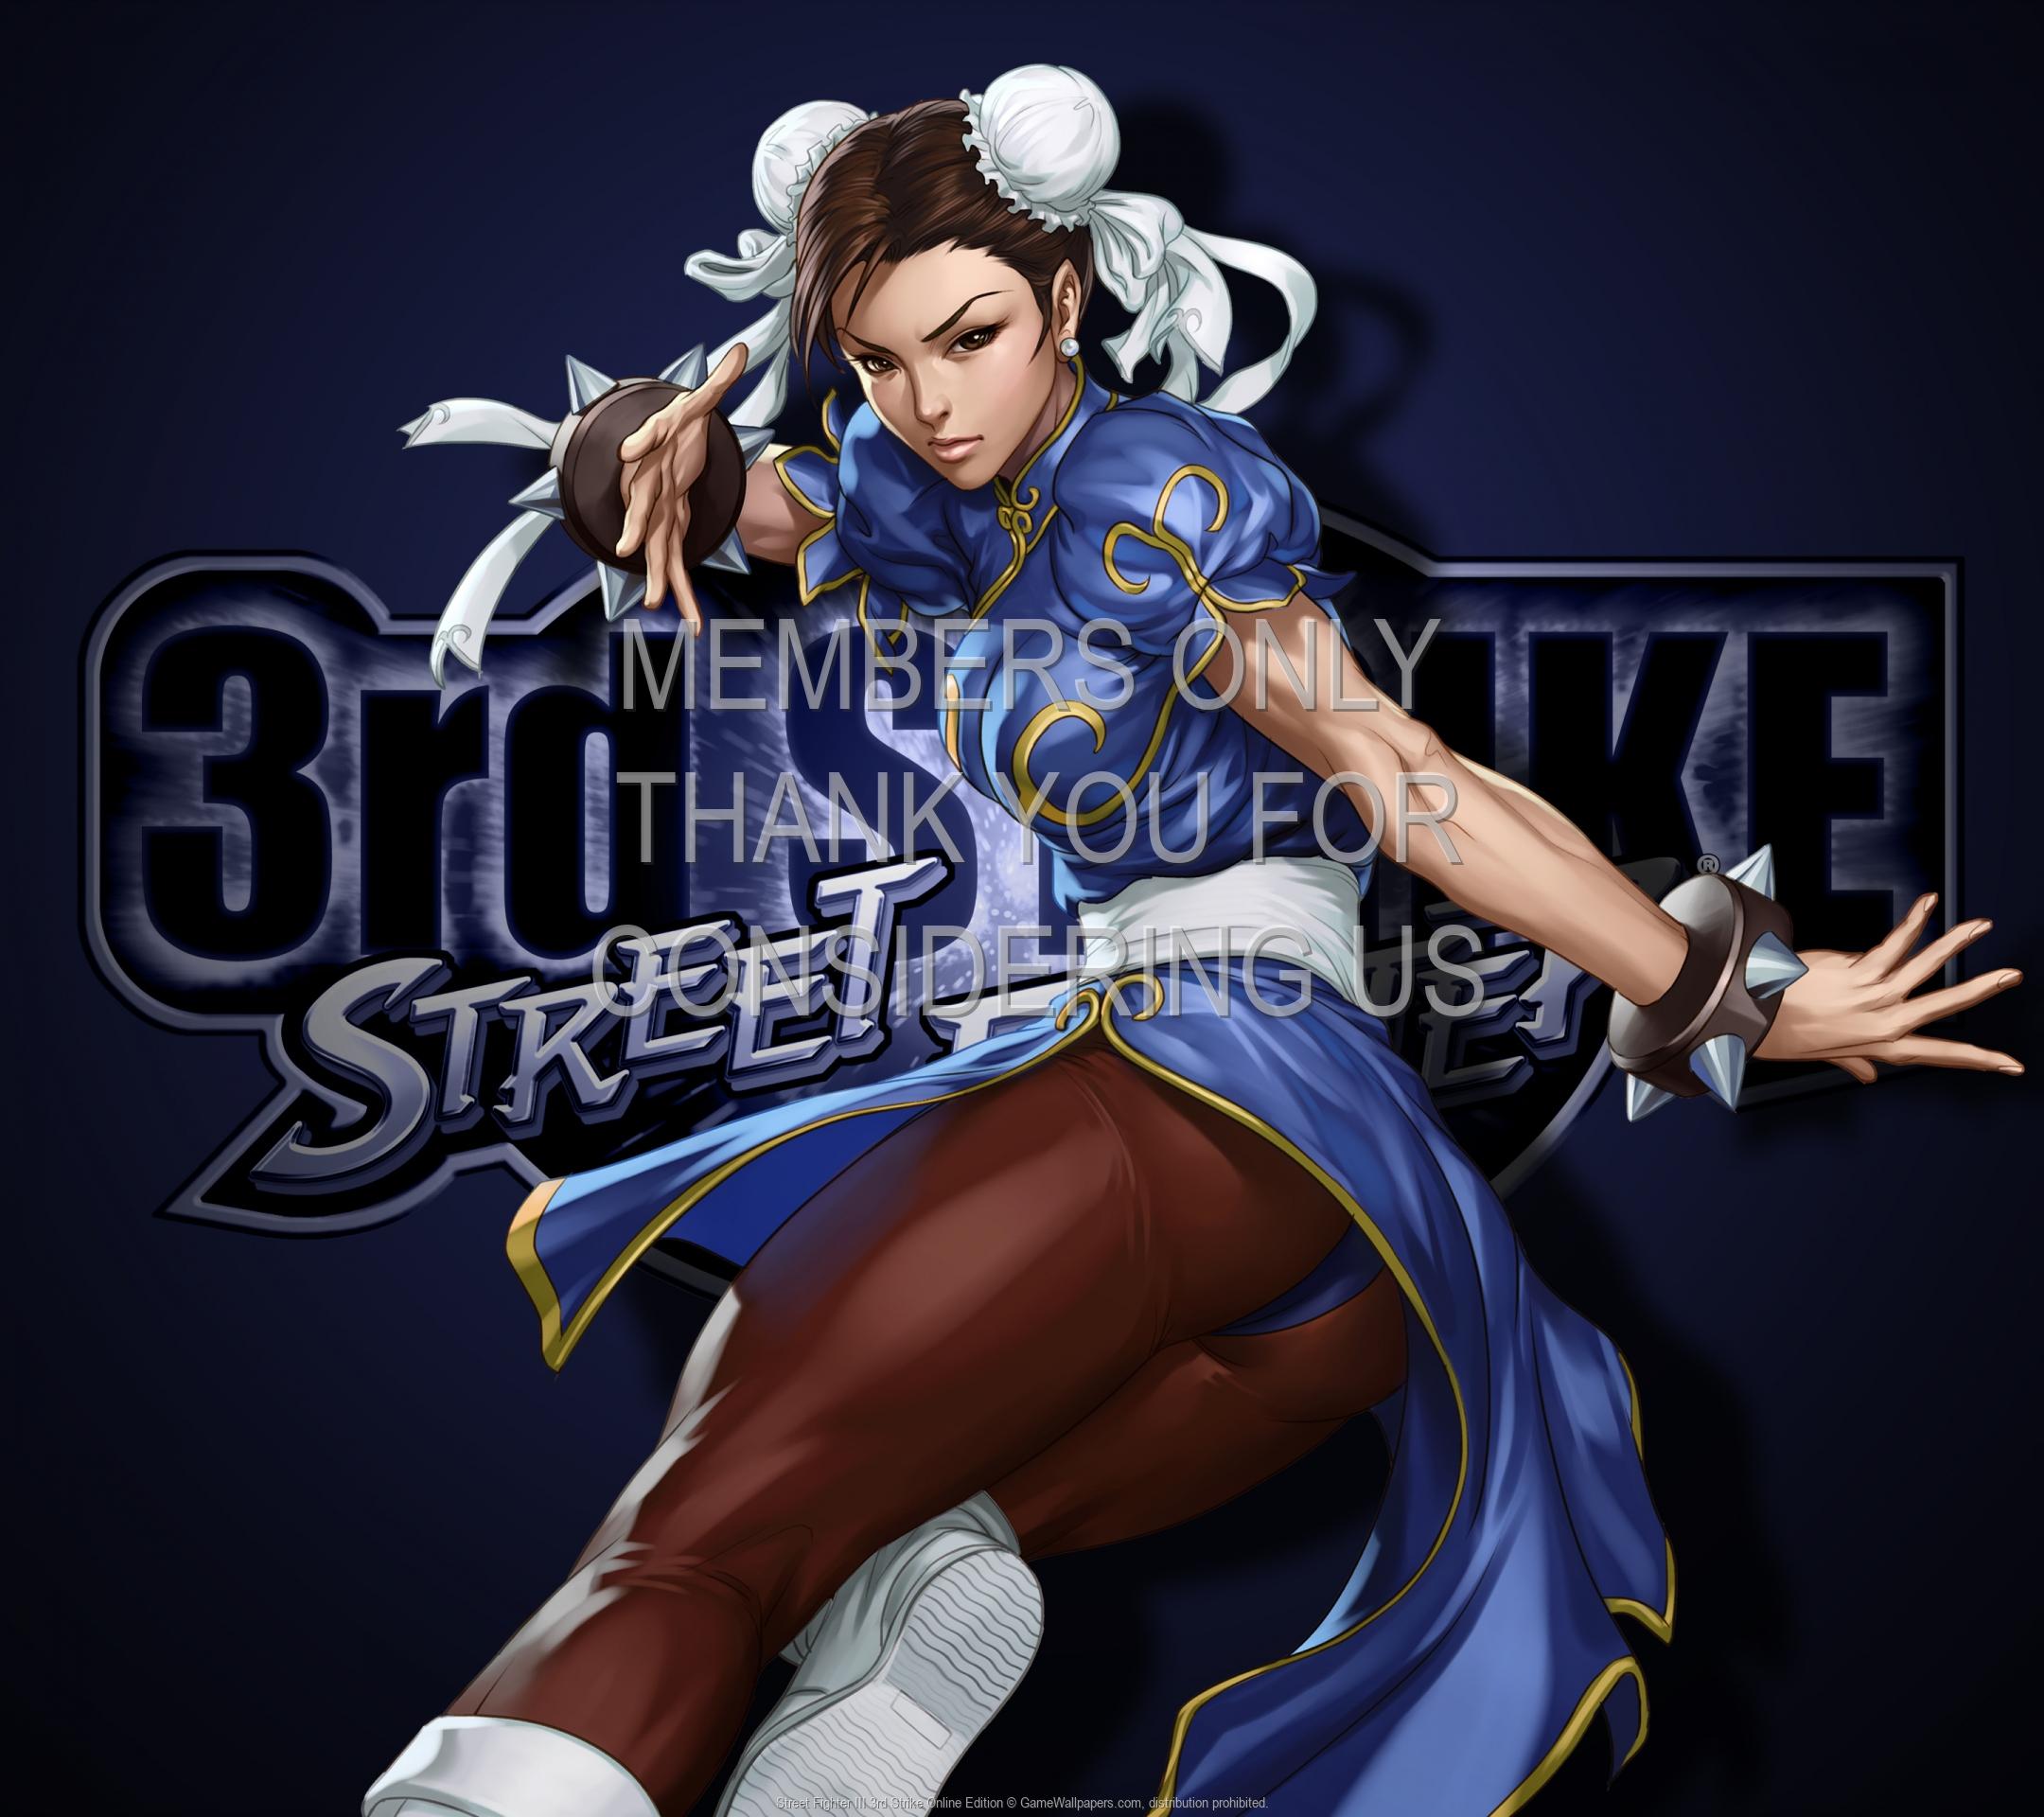 Street Fighter Iii 3rd Strike Online Edition Wallpaper 01 1920x1080